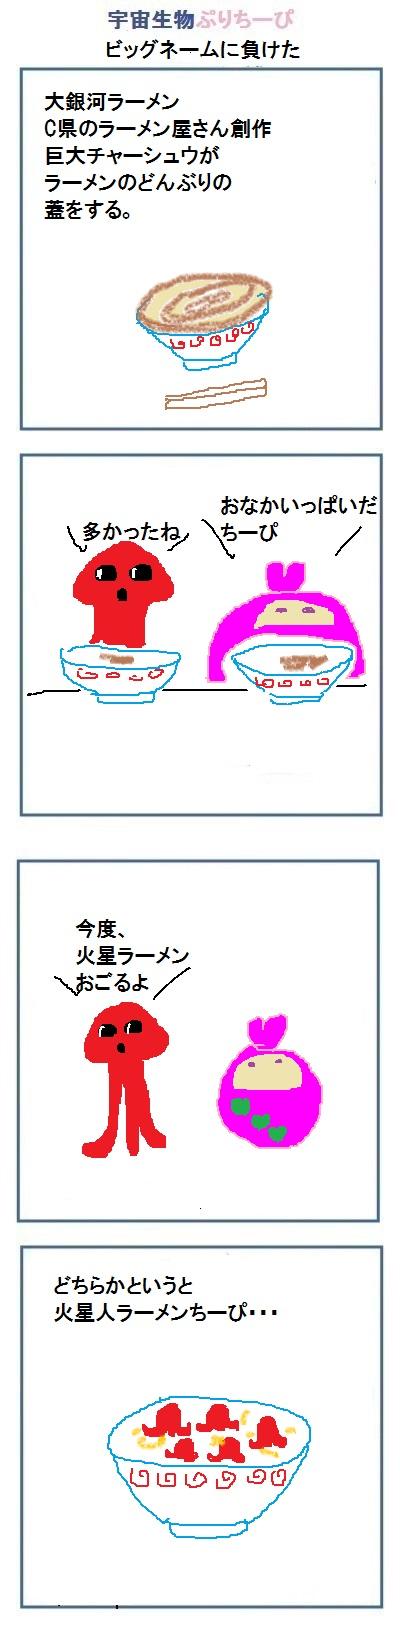 160726_kinsei53.jpg